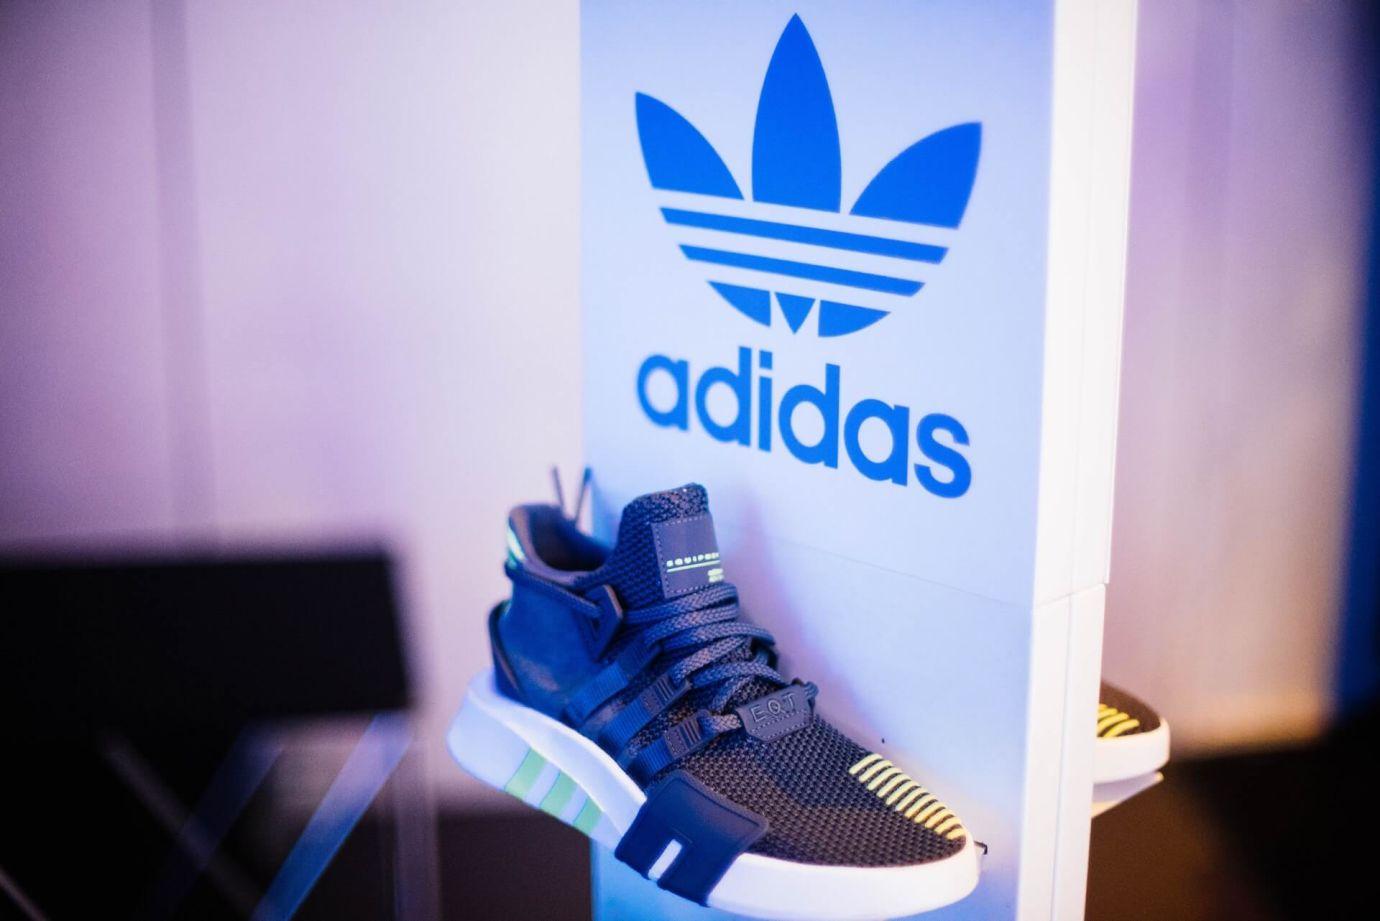 Wie fallen Adidas Sneaker aus?